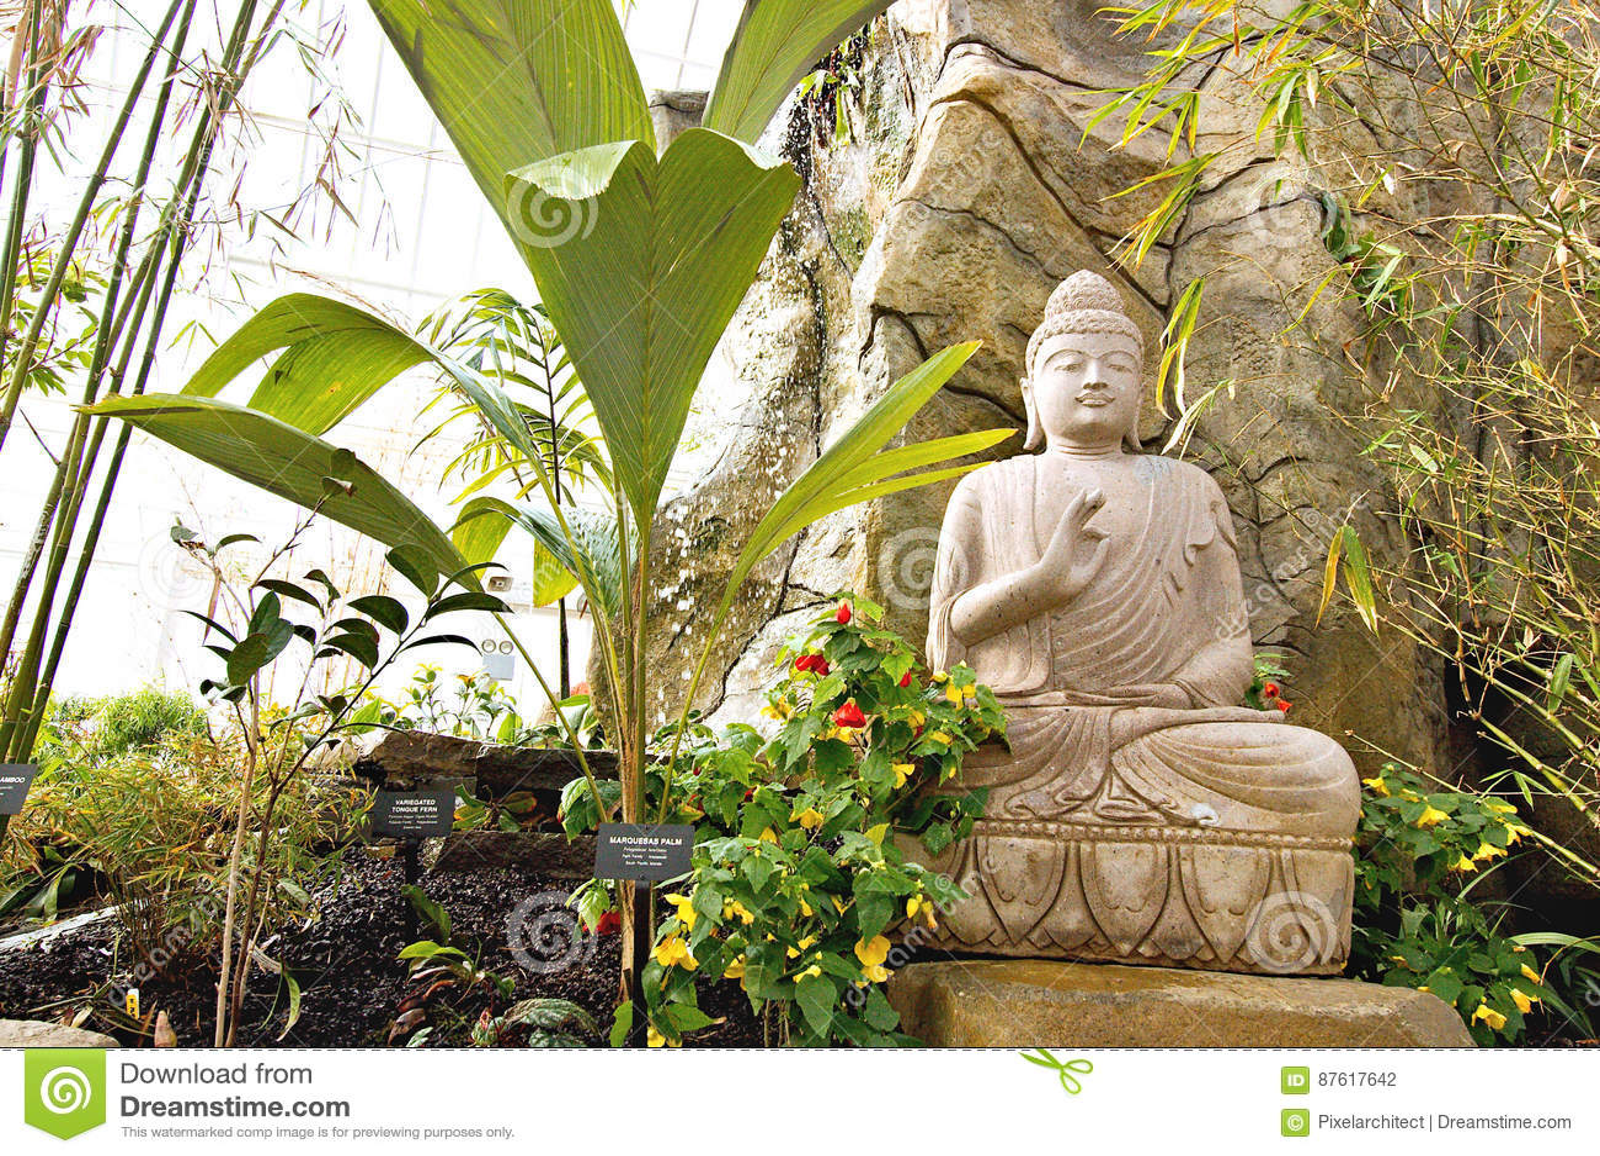 Buddha In The Garden Editorial Photography Image Of Gardens 87617642